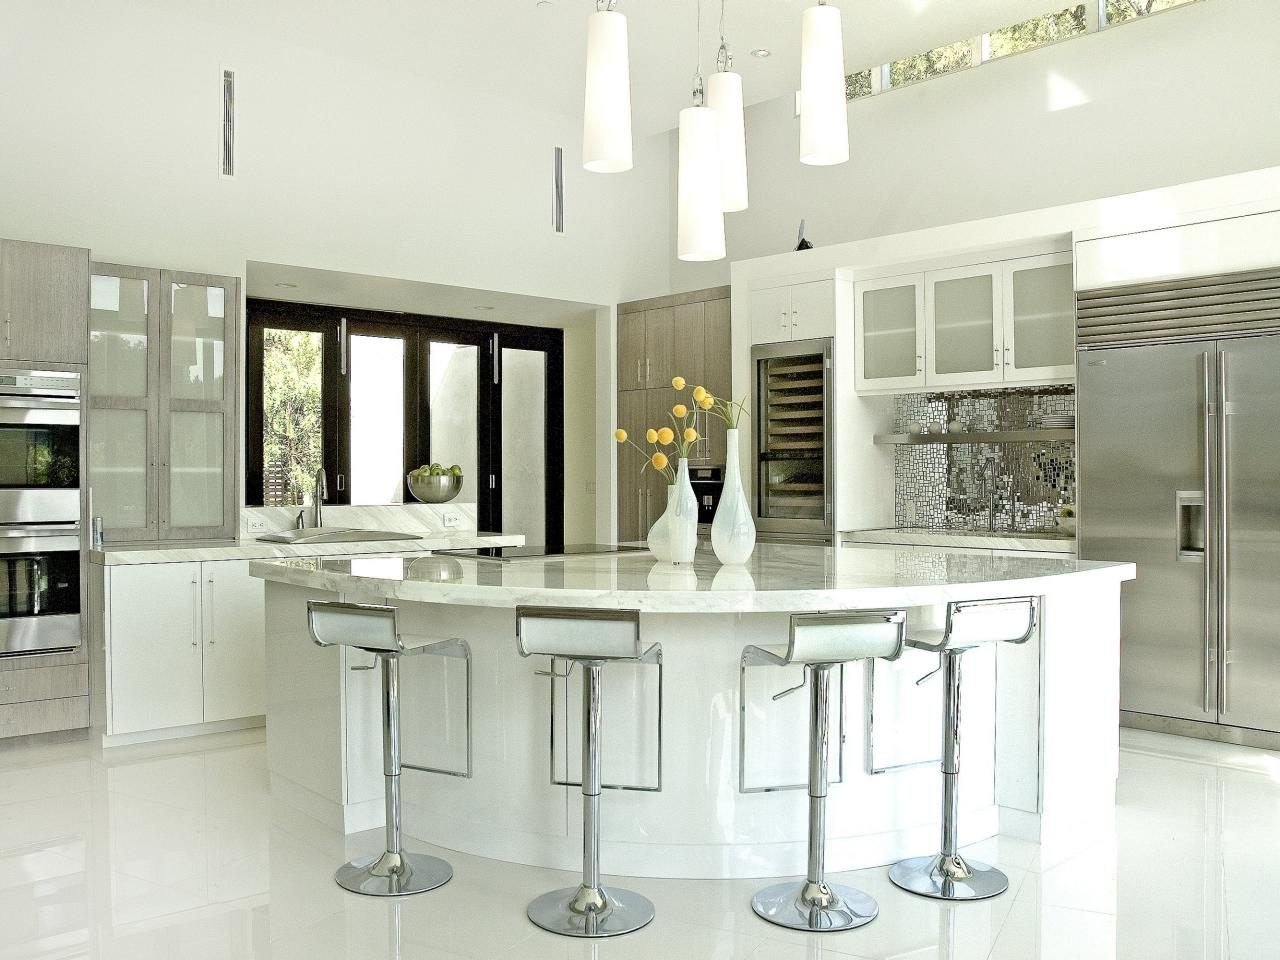 Kitchen Backsplash Ideas For White Cabinets Modern Minimalist Cool White Kitchen Design Decorating Inspiration